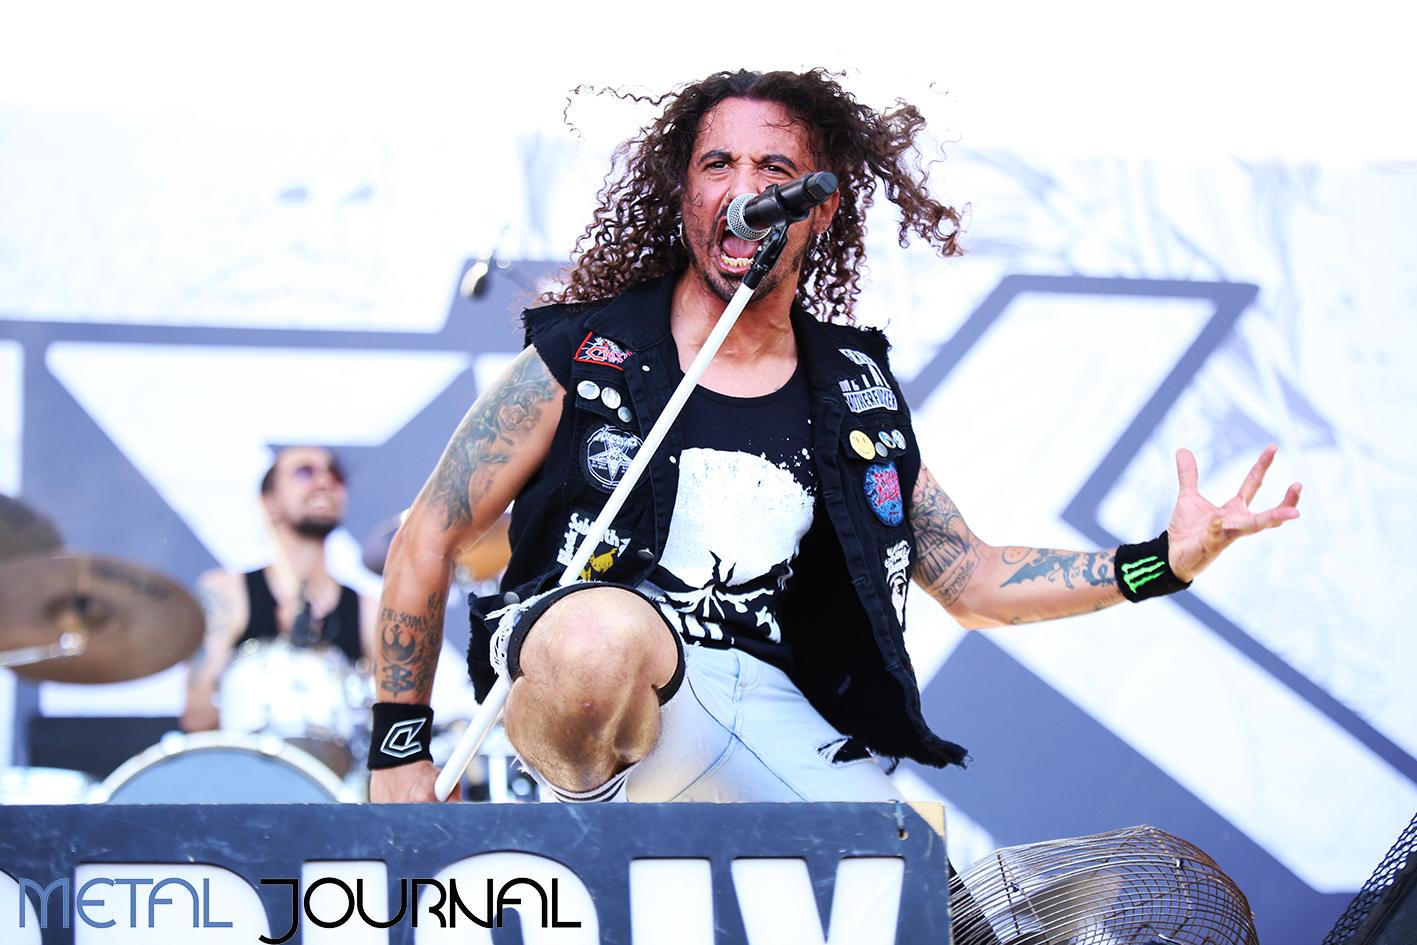 crisix - leyendas del rock 2019 metal journal pic 8